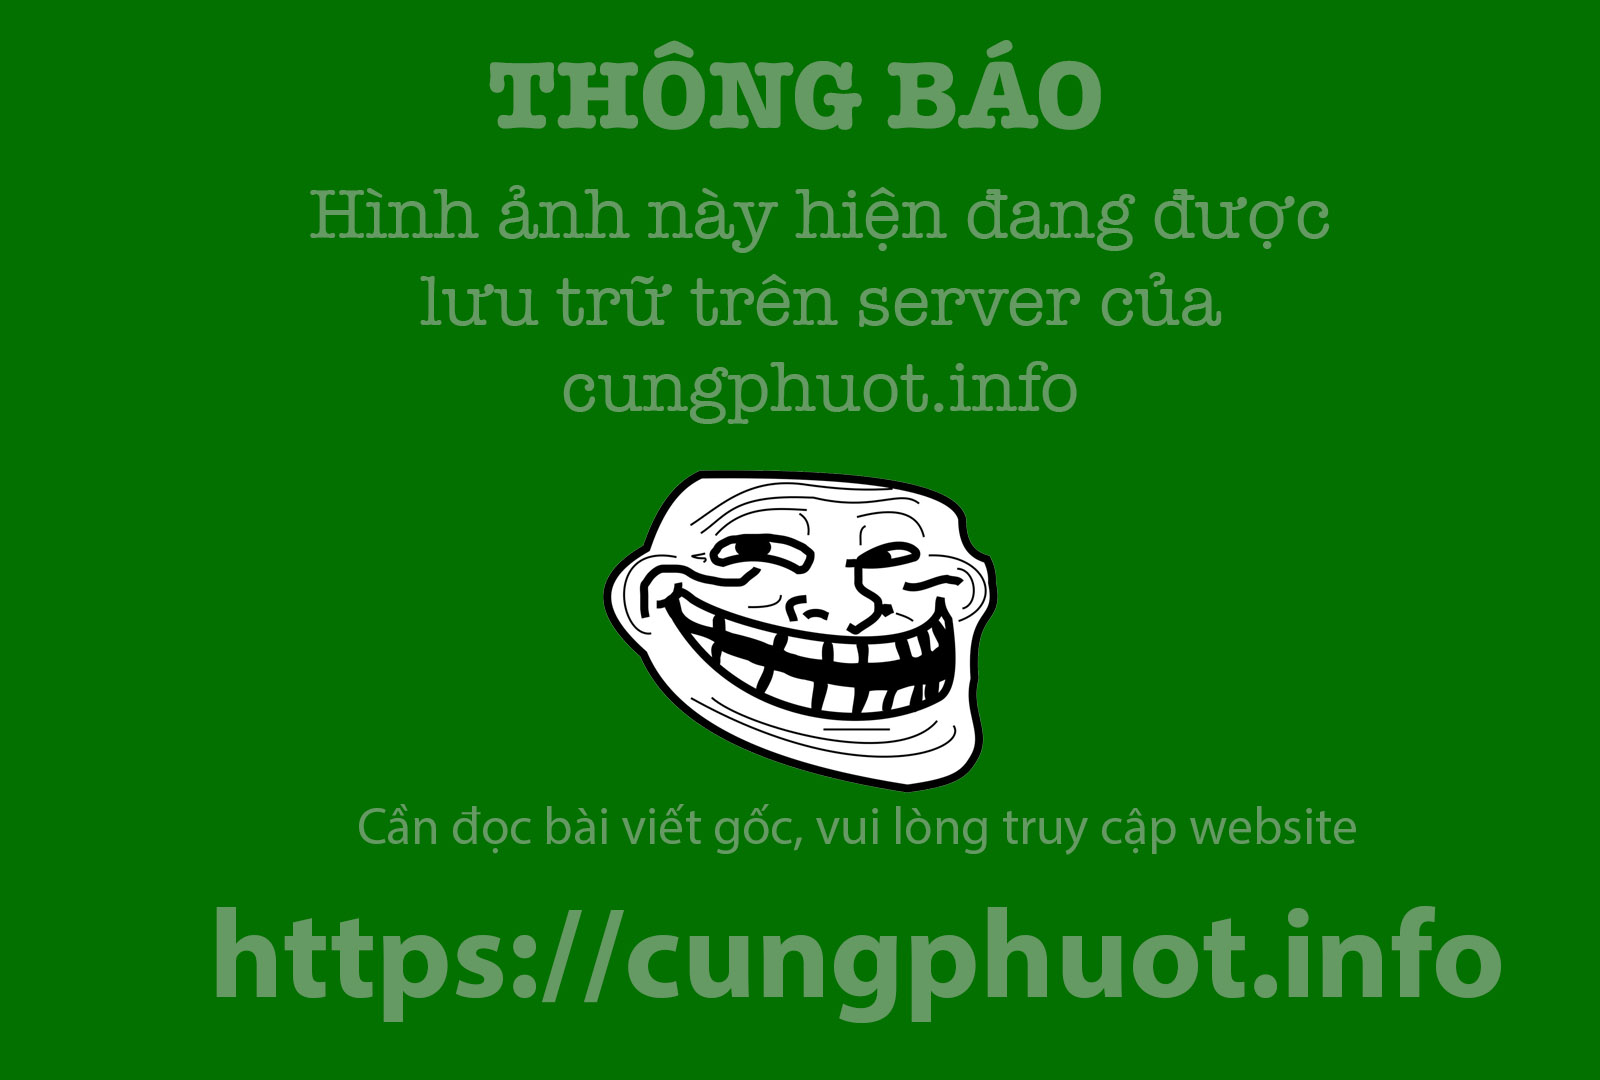 nhung-tiem-ca-phe-dep-phai-di-mot-lan-cho-biet-o-da-nang-ivivu-7